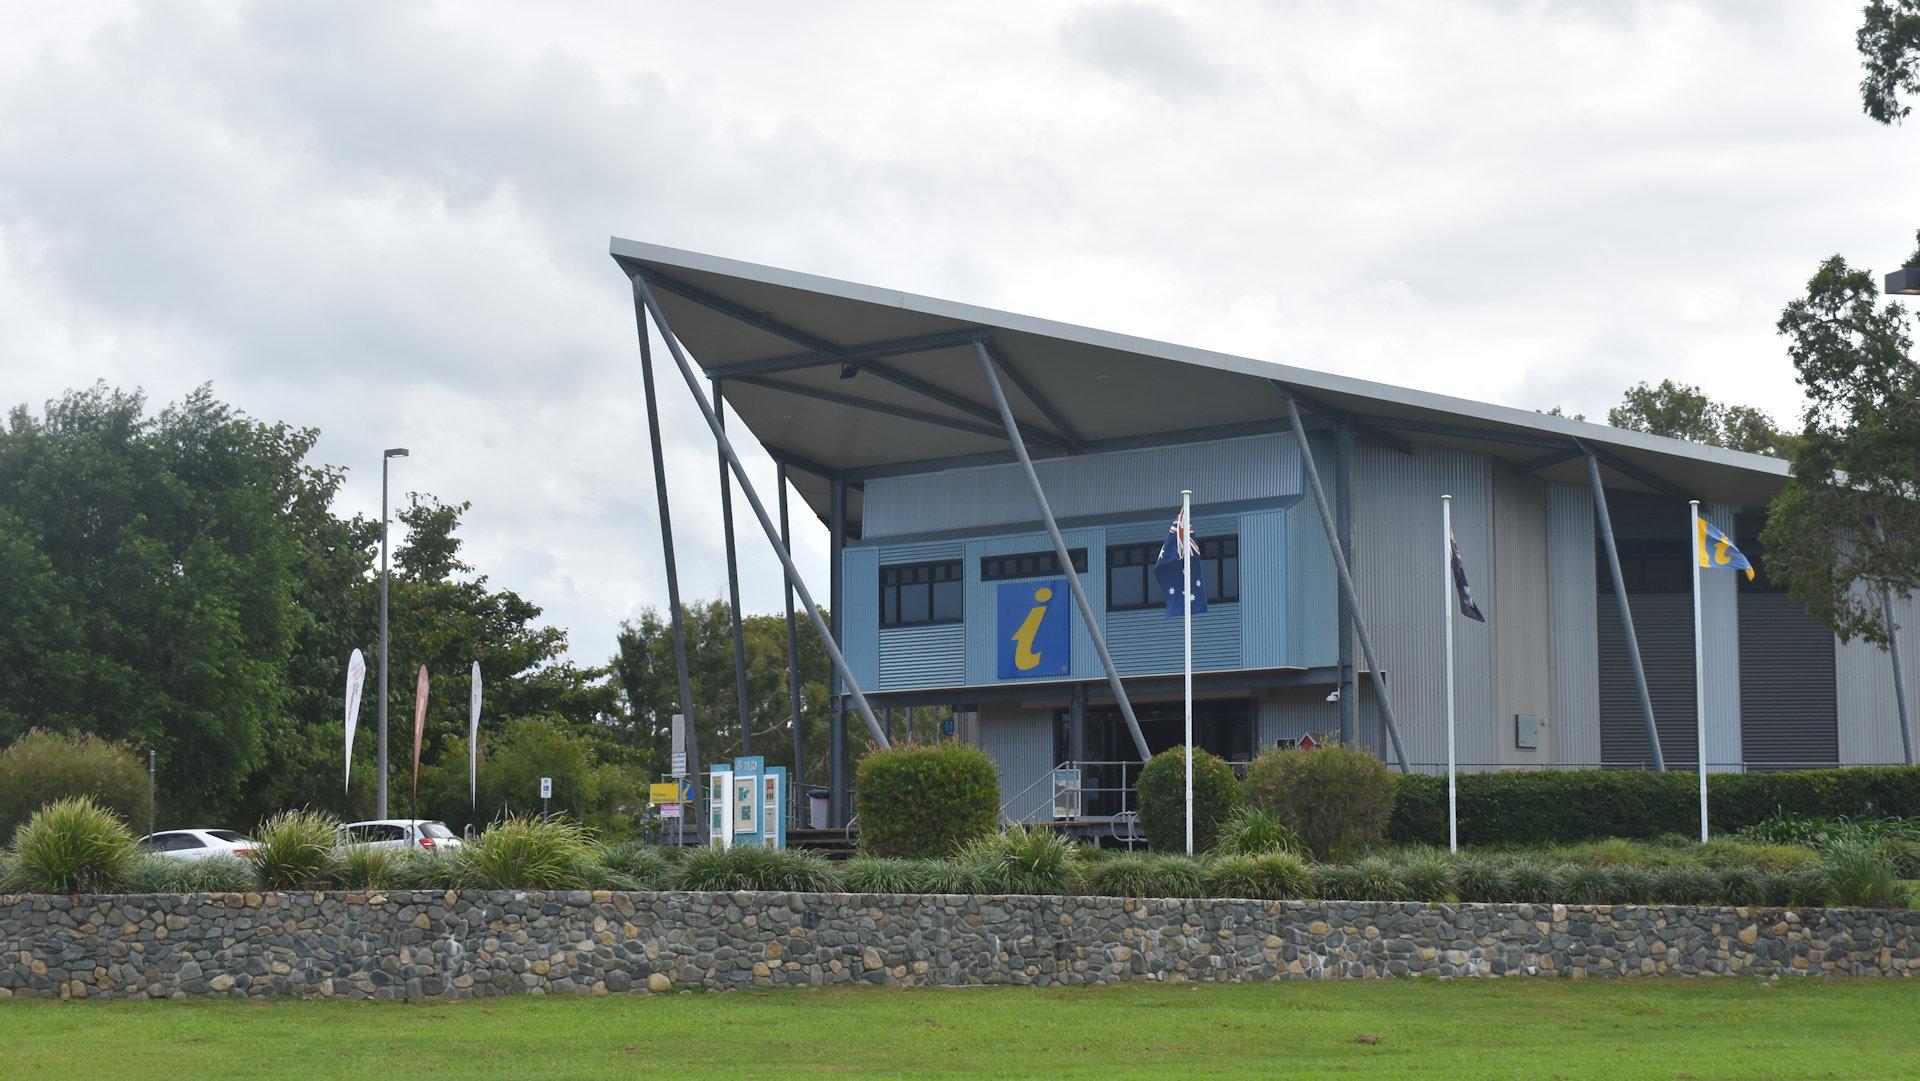 Hinchinbrook Visitor Information Centre in Ingham